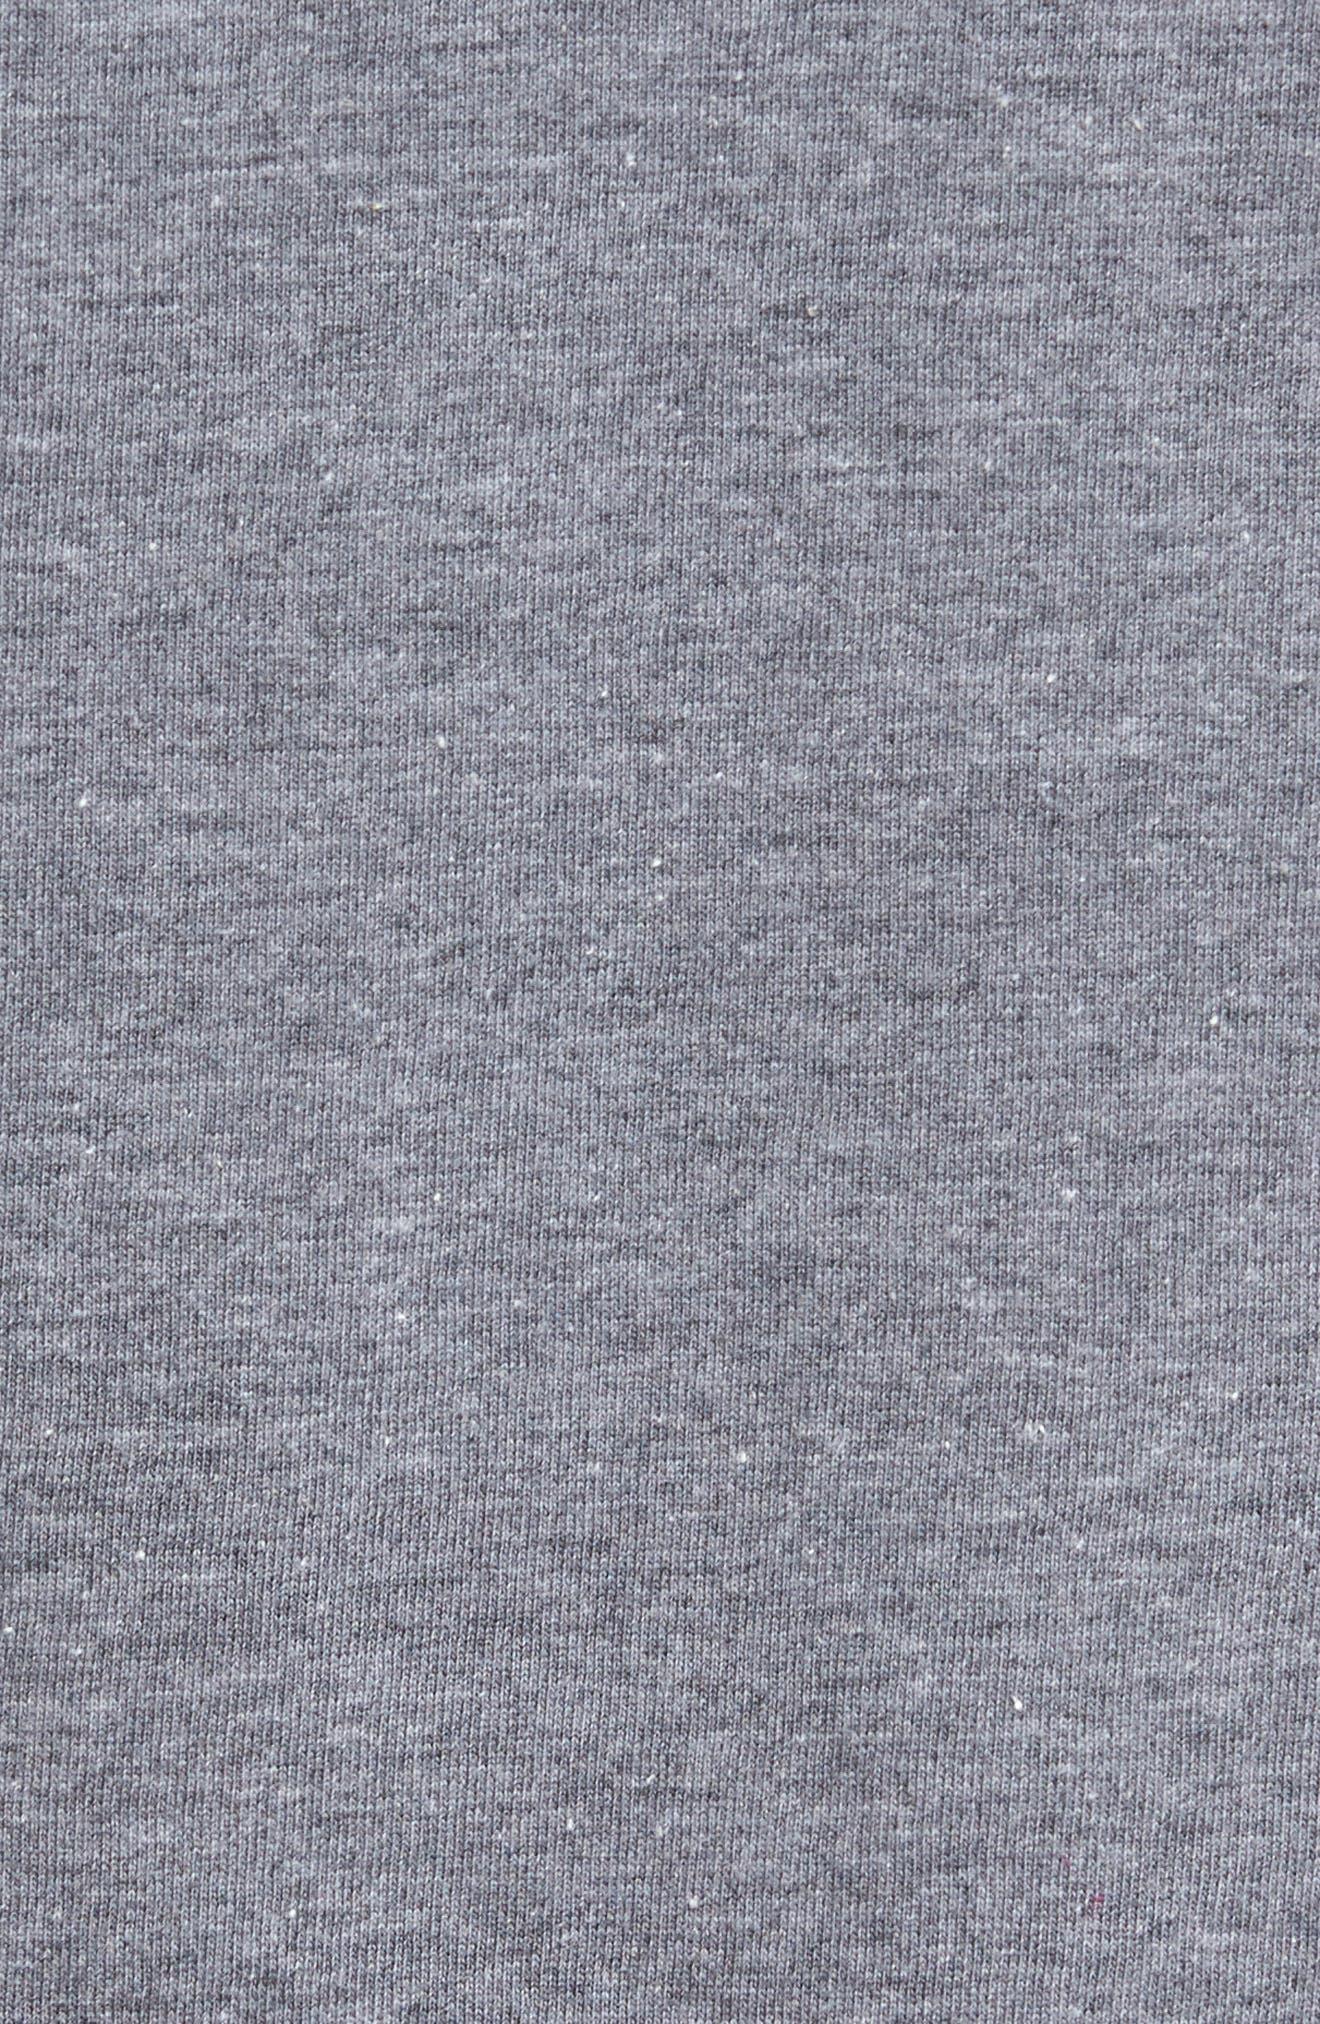 Planer Raglan T-Shirt,                             Alternate thumbnail 5, color,                             020